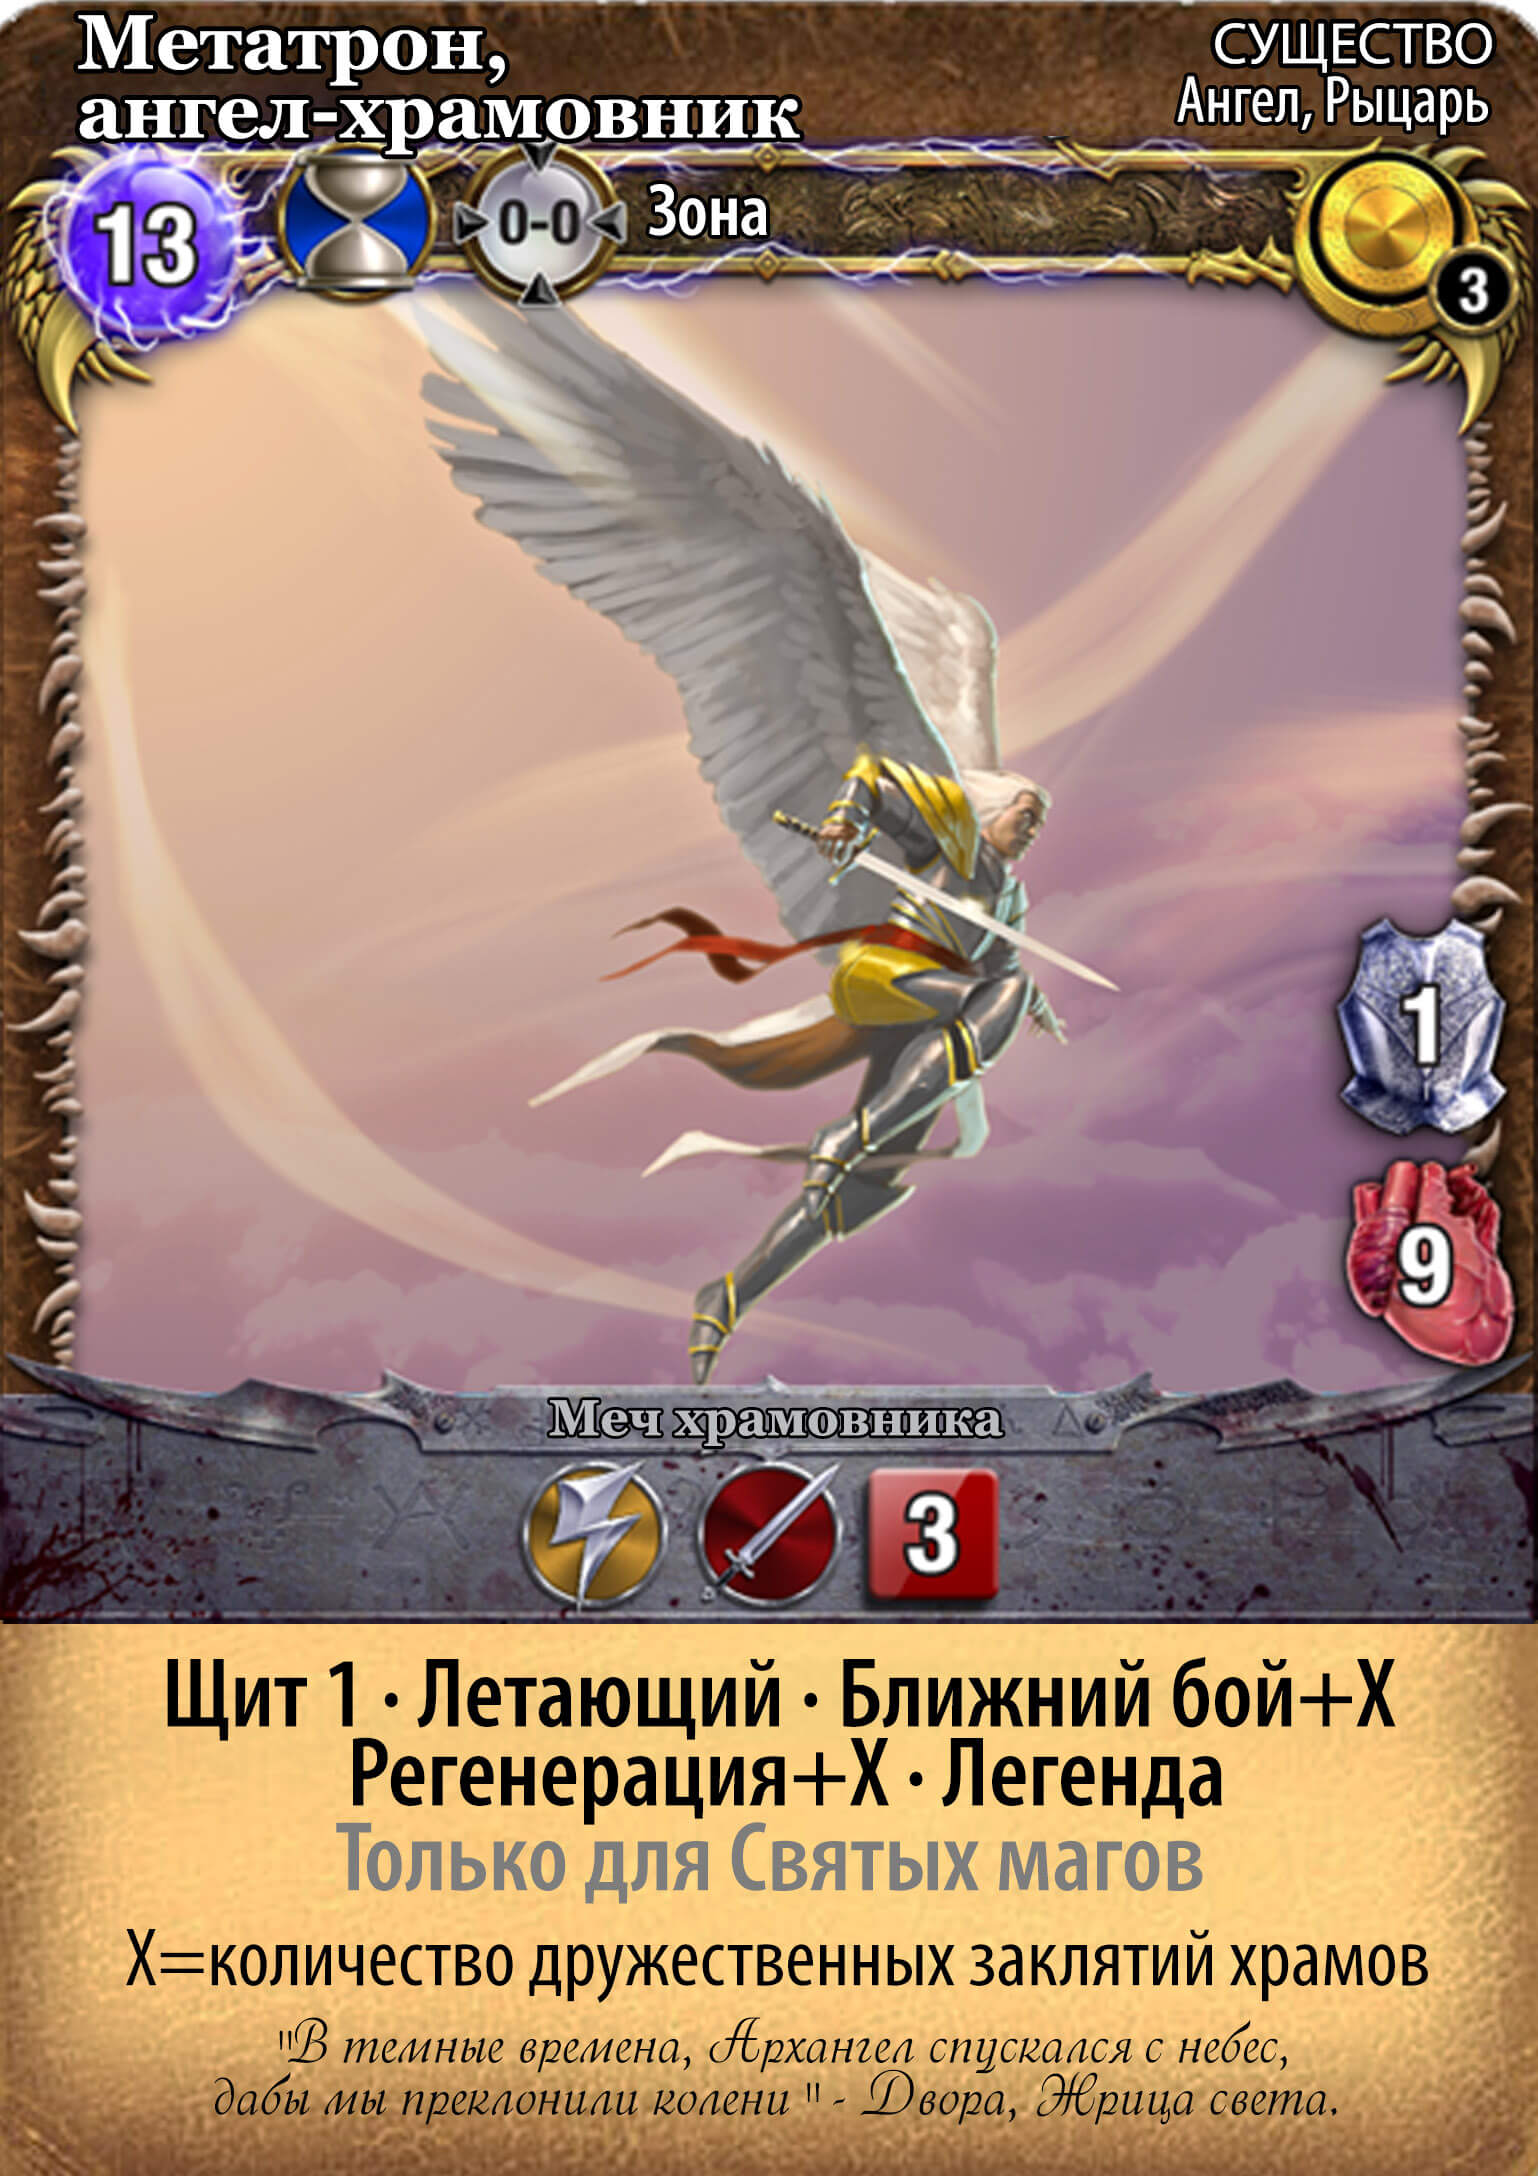 Метатрон, ангел-храмовник